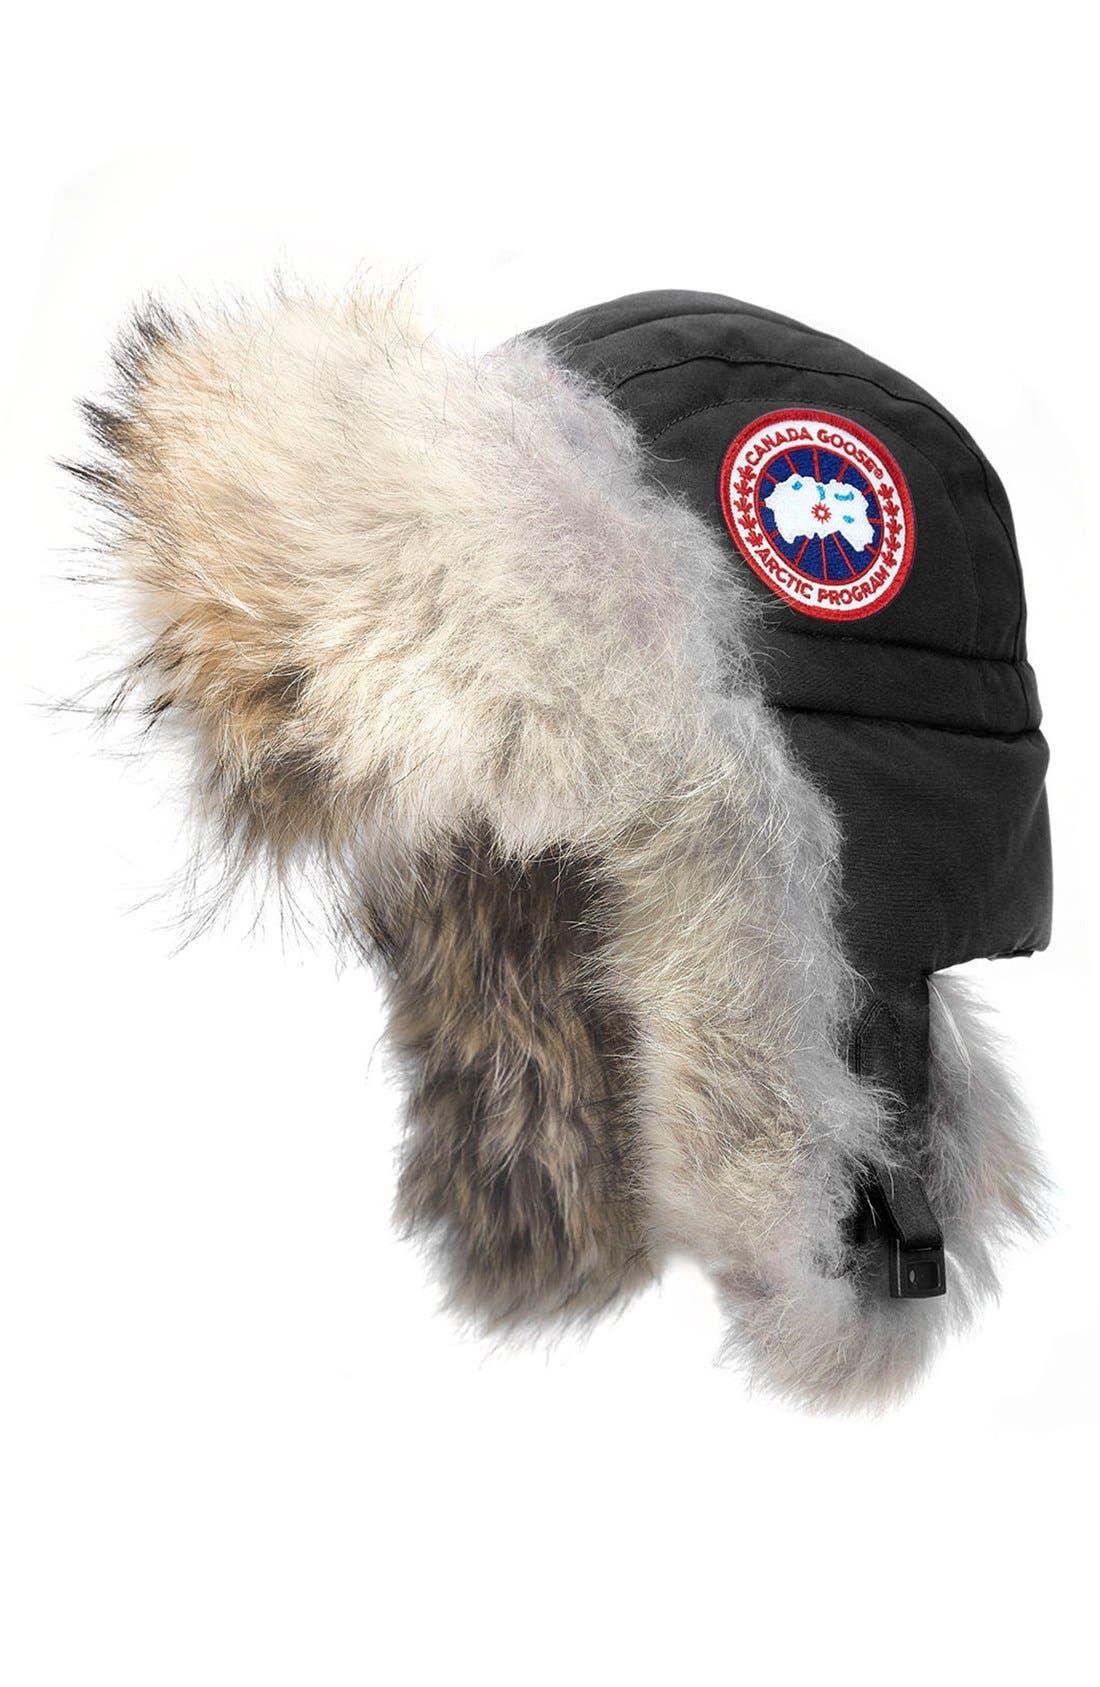 Canada Goose Aviator Hat with Genuine Coyote Fur Trim